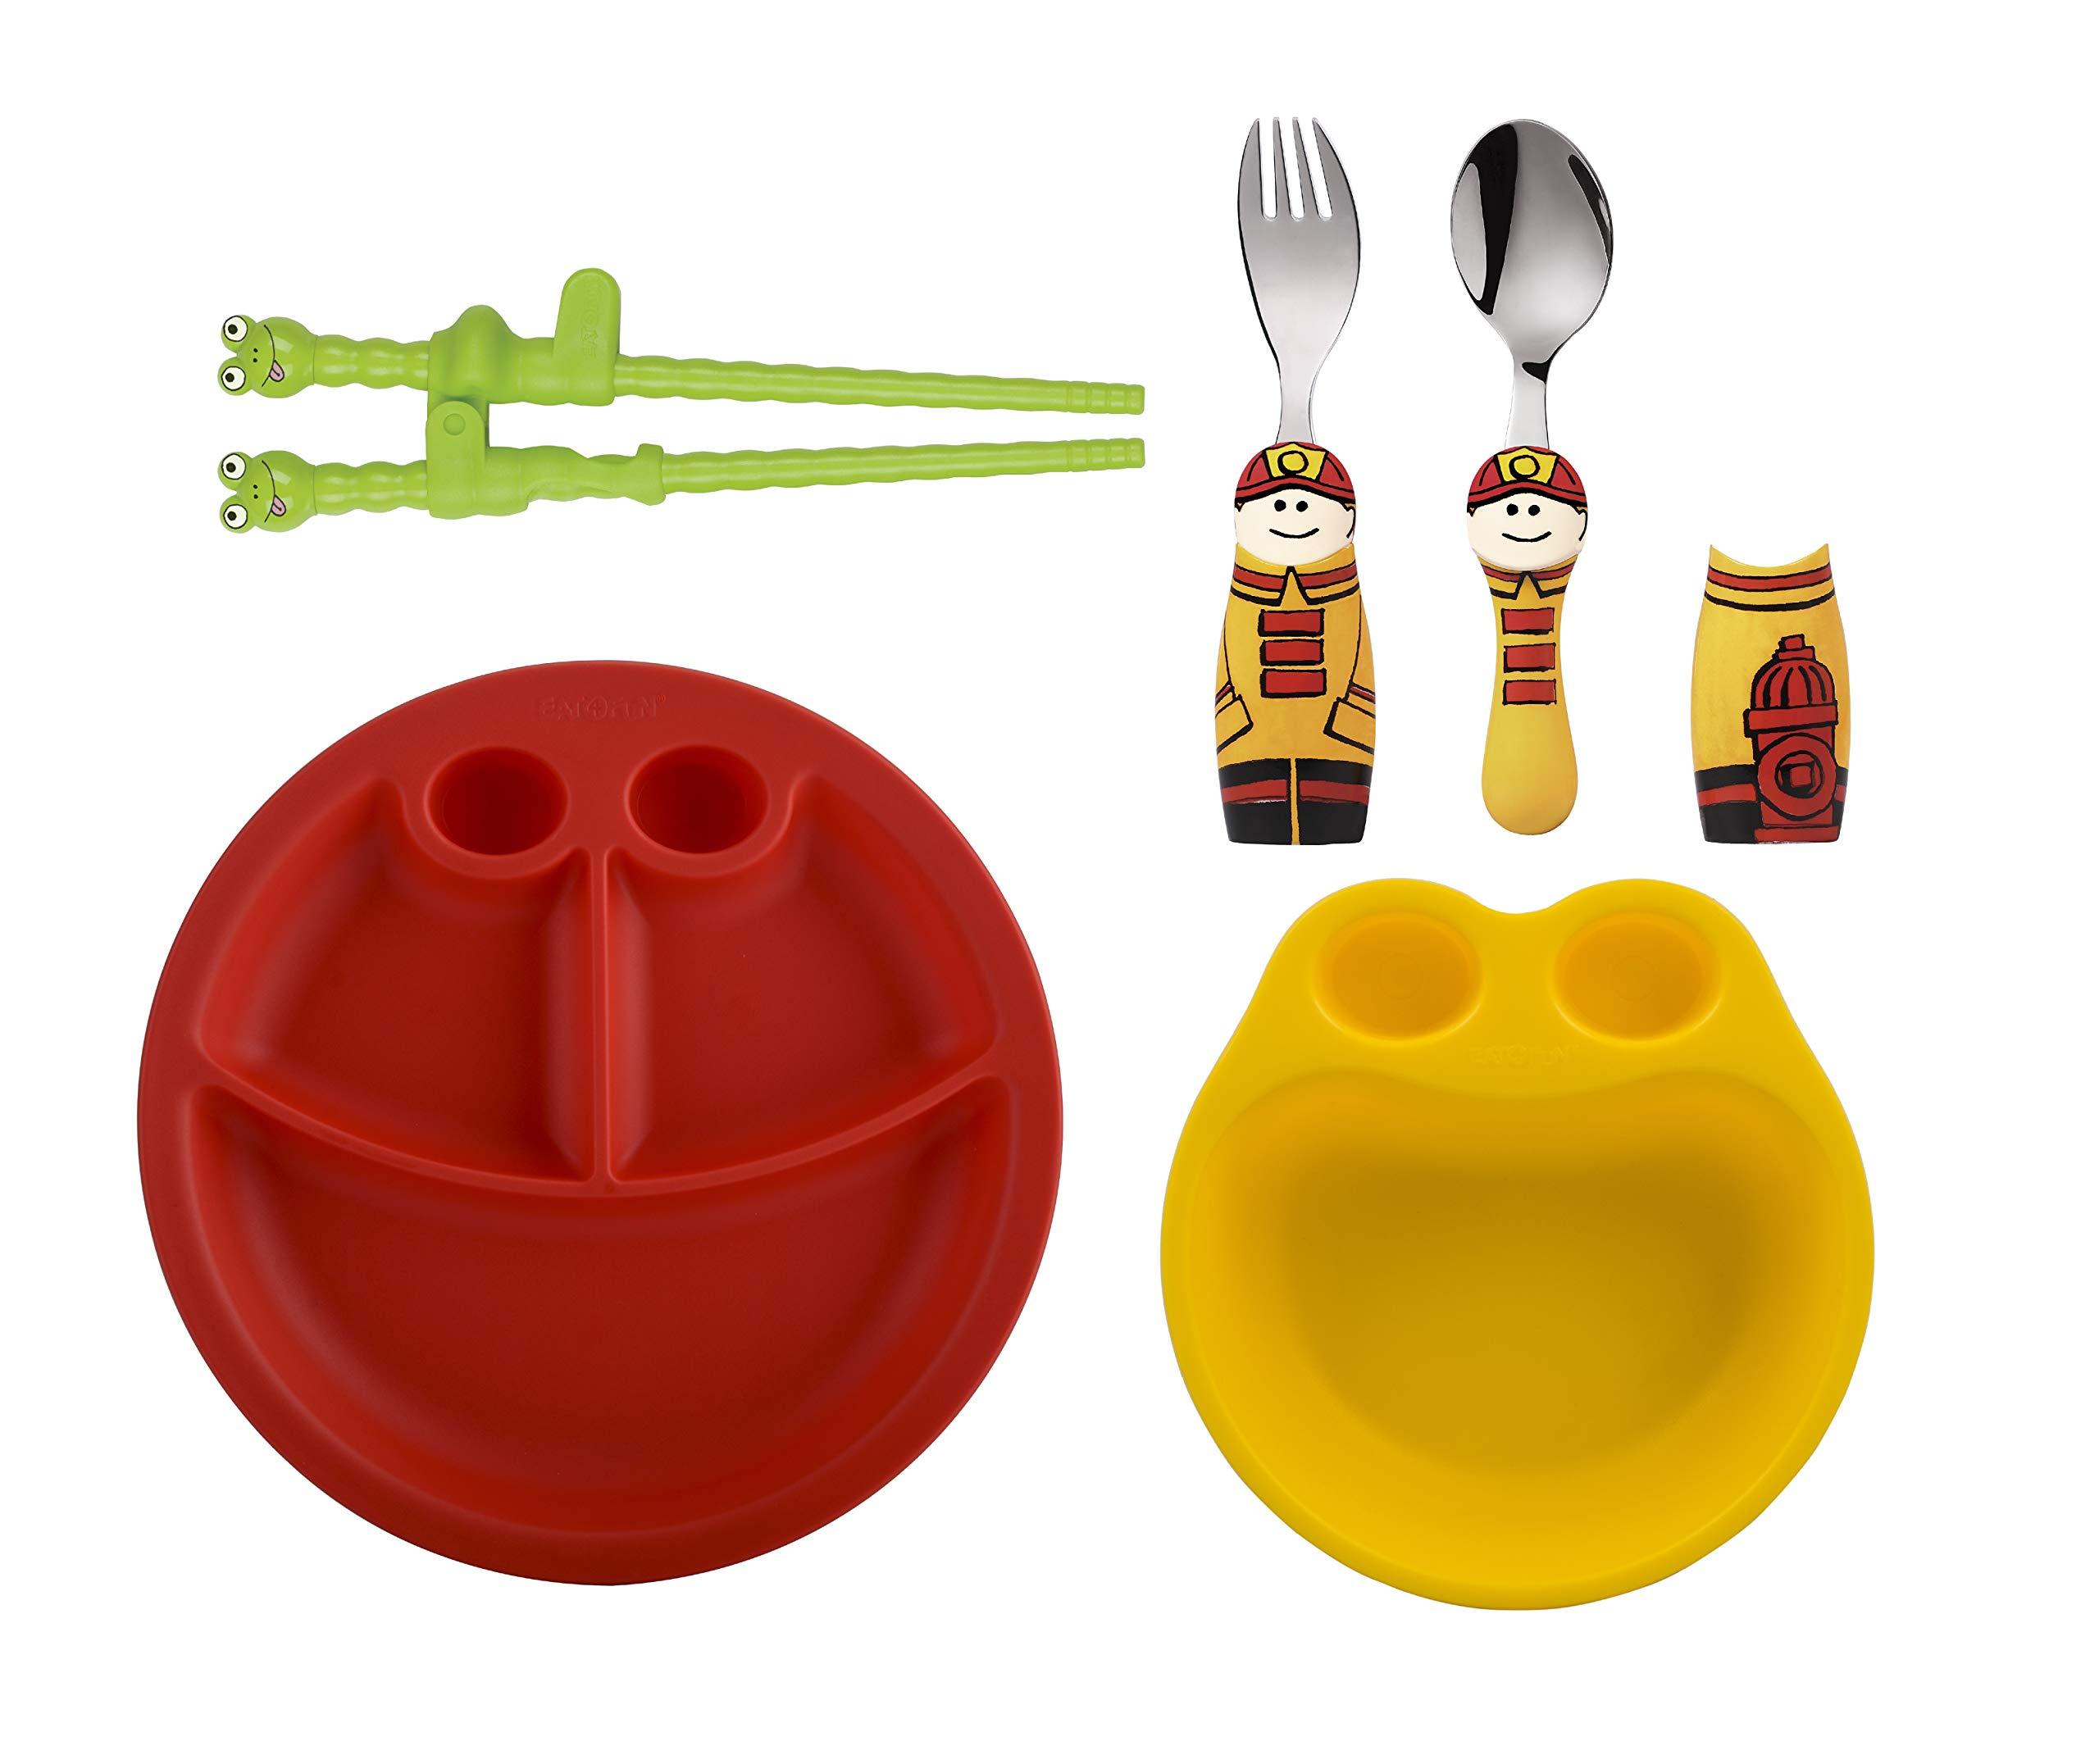 Eat4Fun Kids and Toddler Utensil Set - Fireman Fork & Spoon Plate and Bowl w/Chopsticks